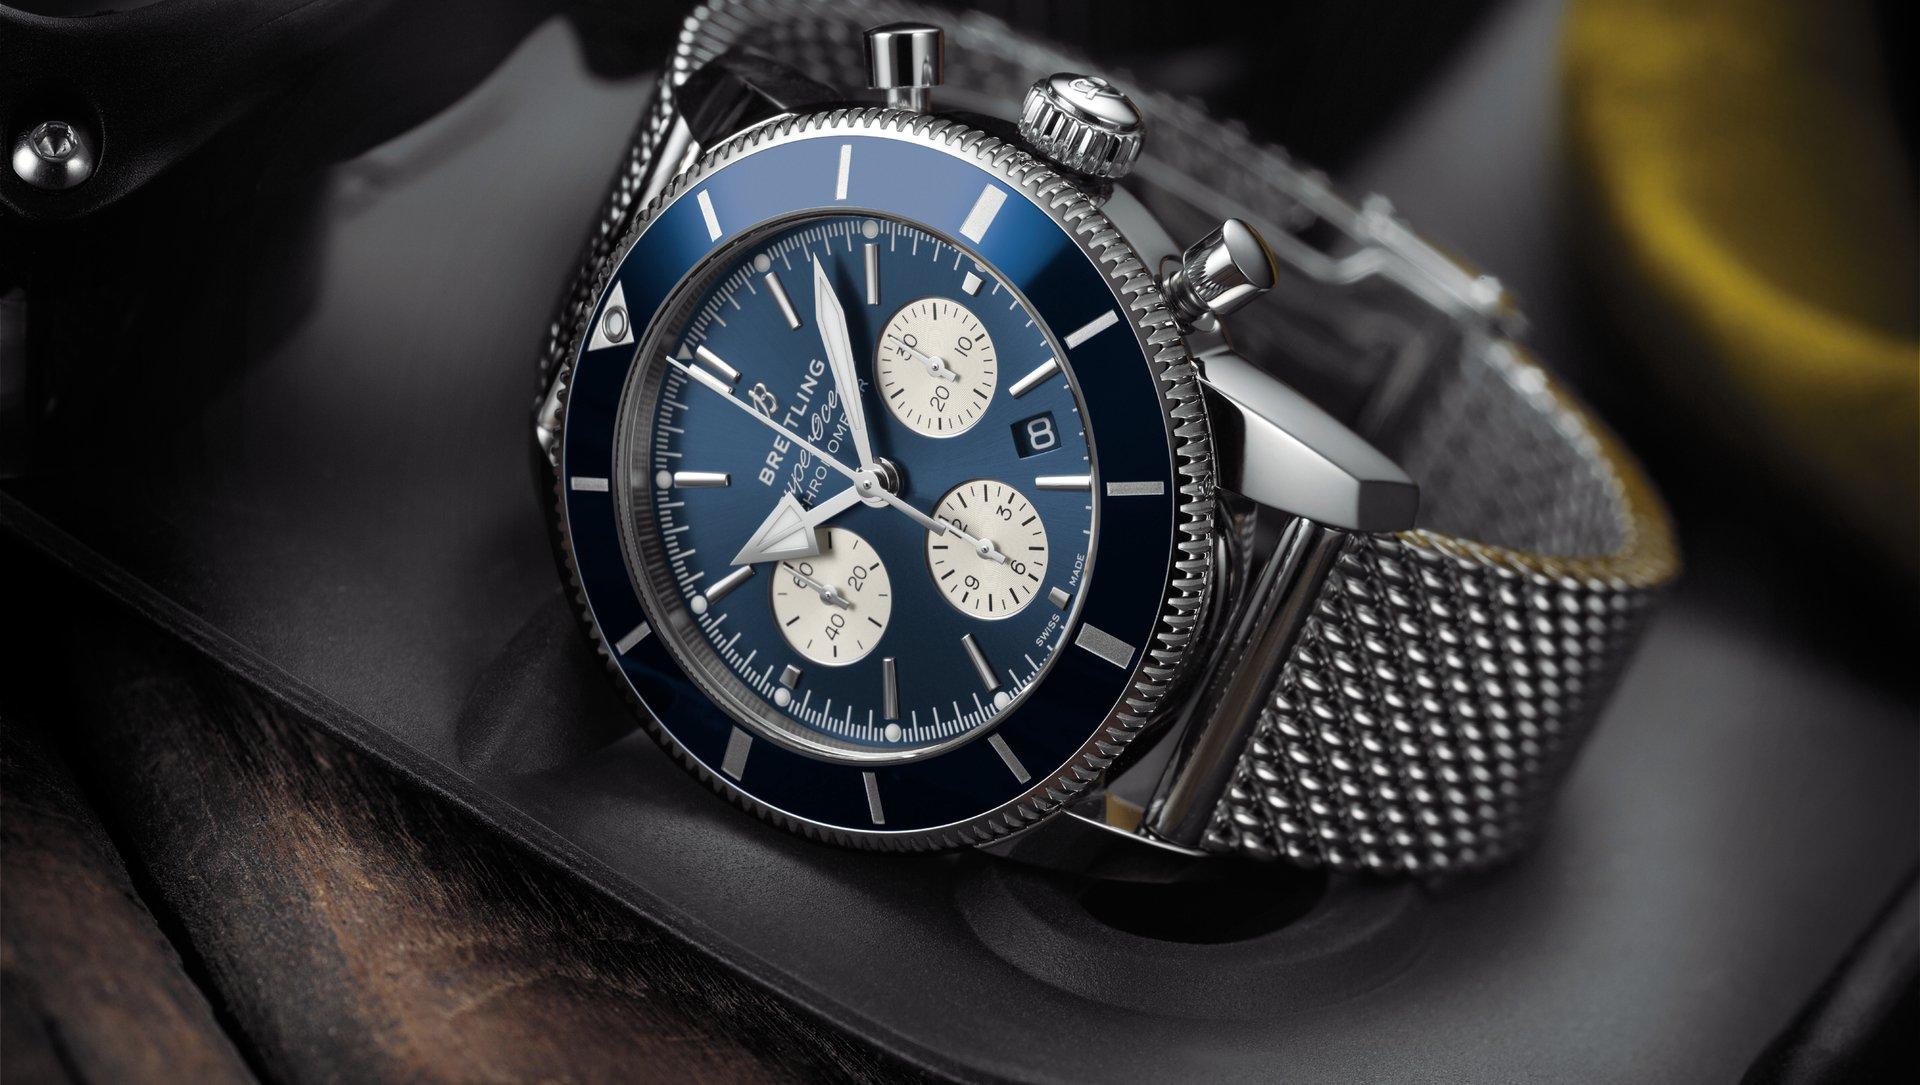 Naziv: superocean-heritage-ii-b01-chronograph-44-with-blue-dial-and-ocean-classic-steel-bracelet.jpg, pregleda: 164, veličina: 252,9 KB